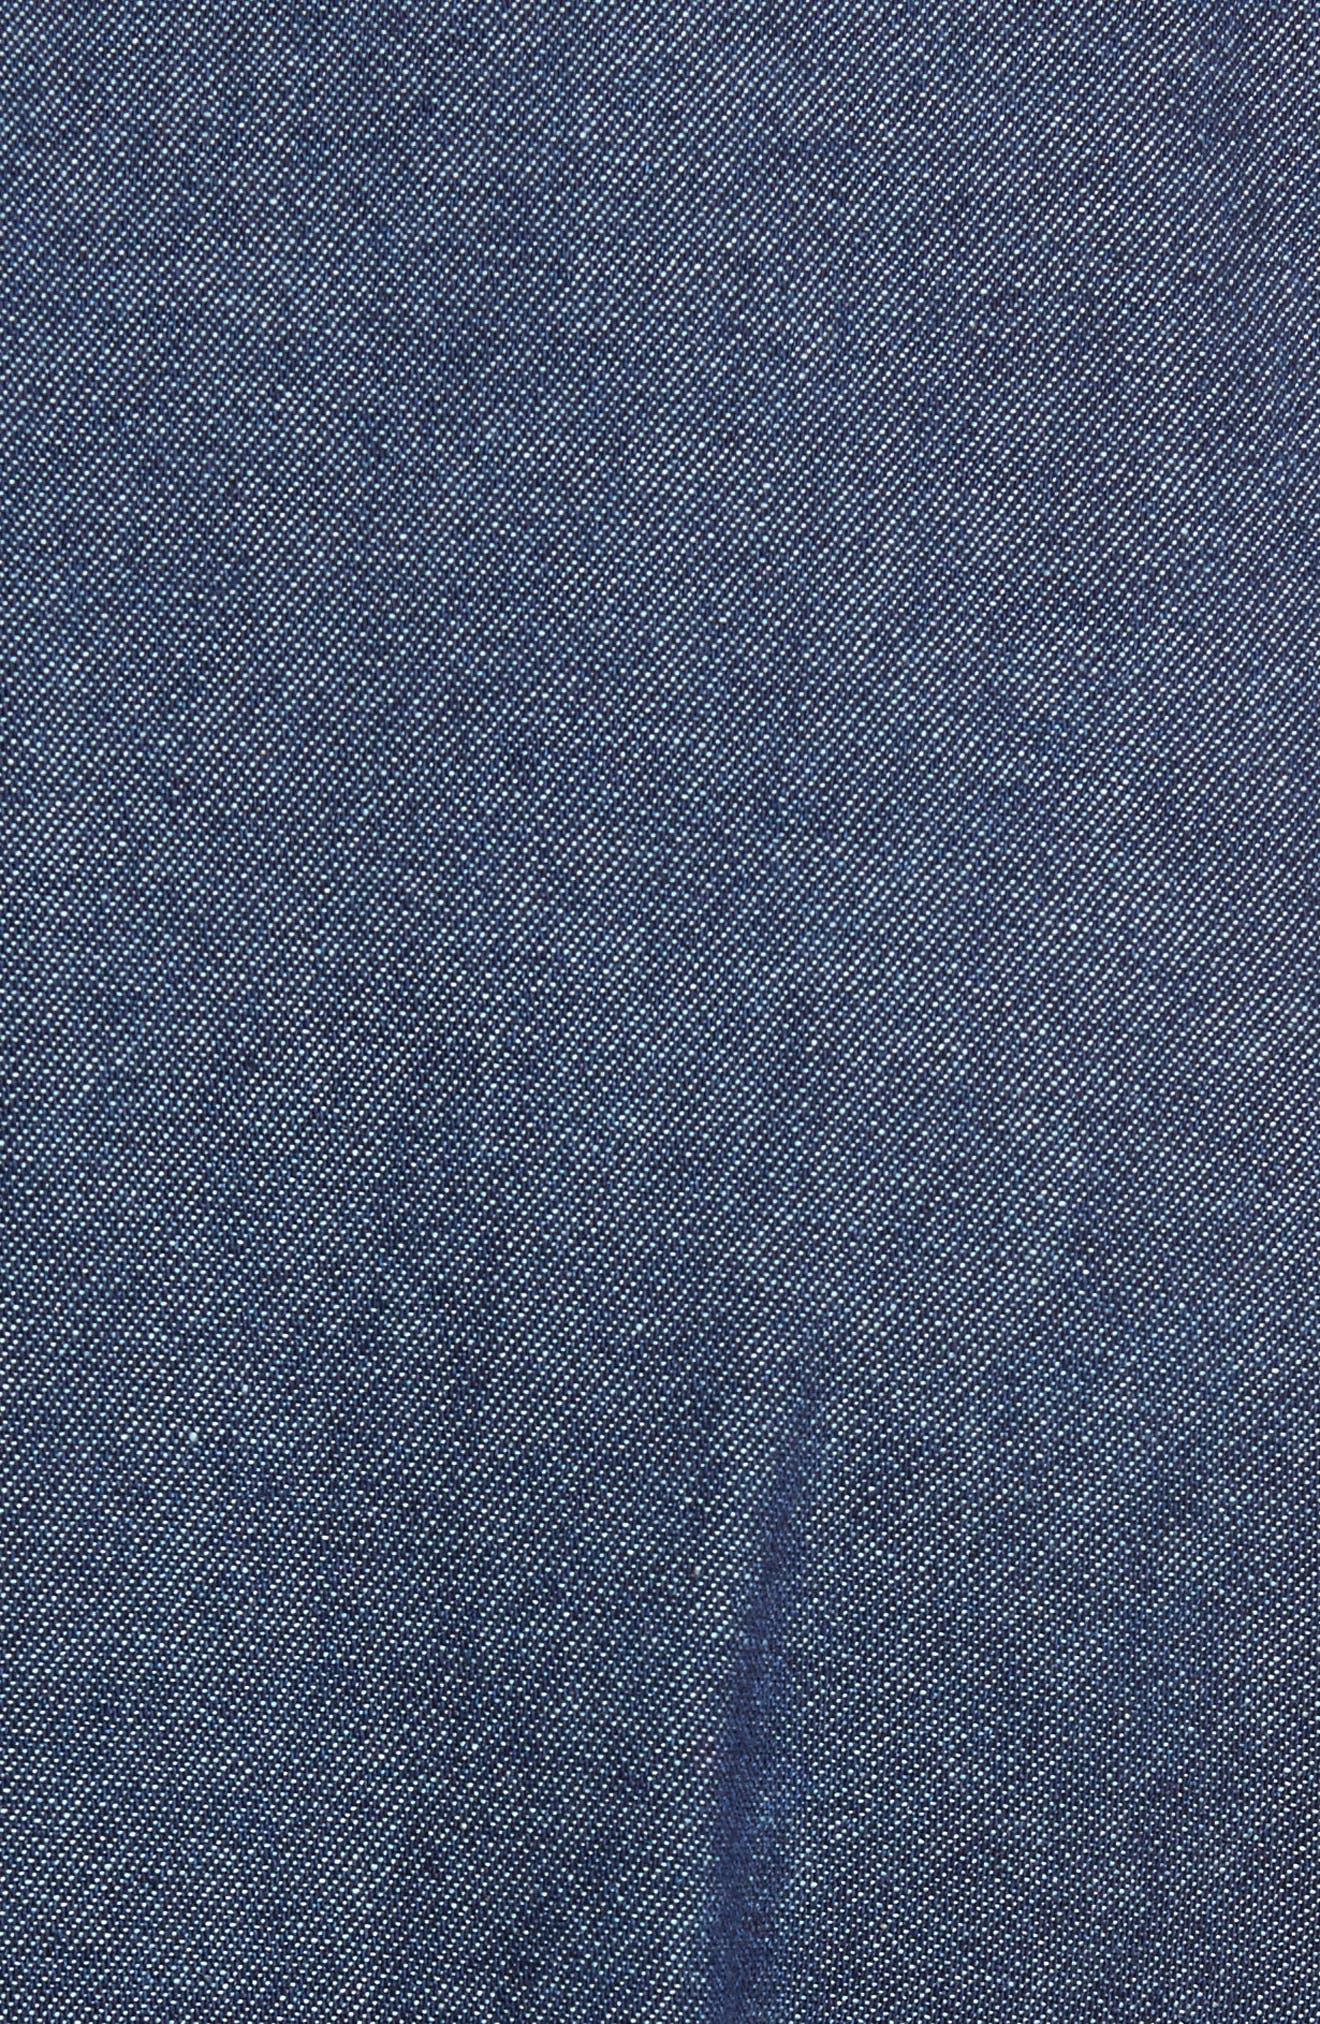 Indigo Long Sleeve Shirt,                             Alternate thumbnail 5, color,                             401